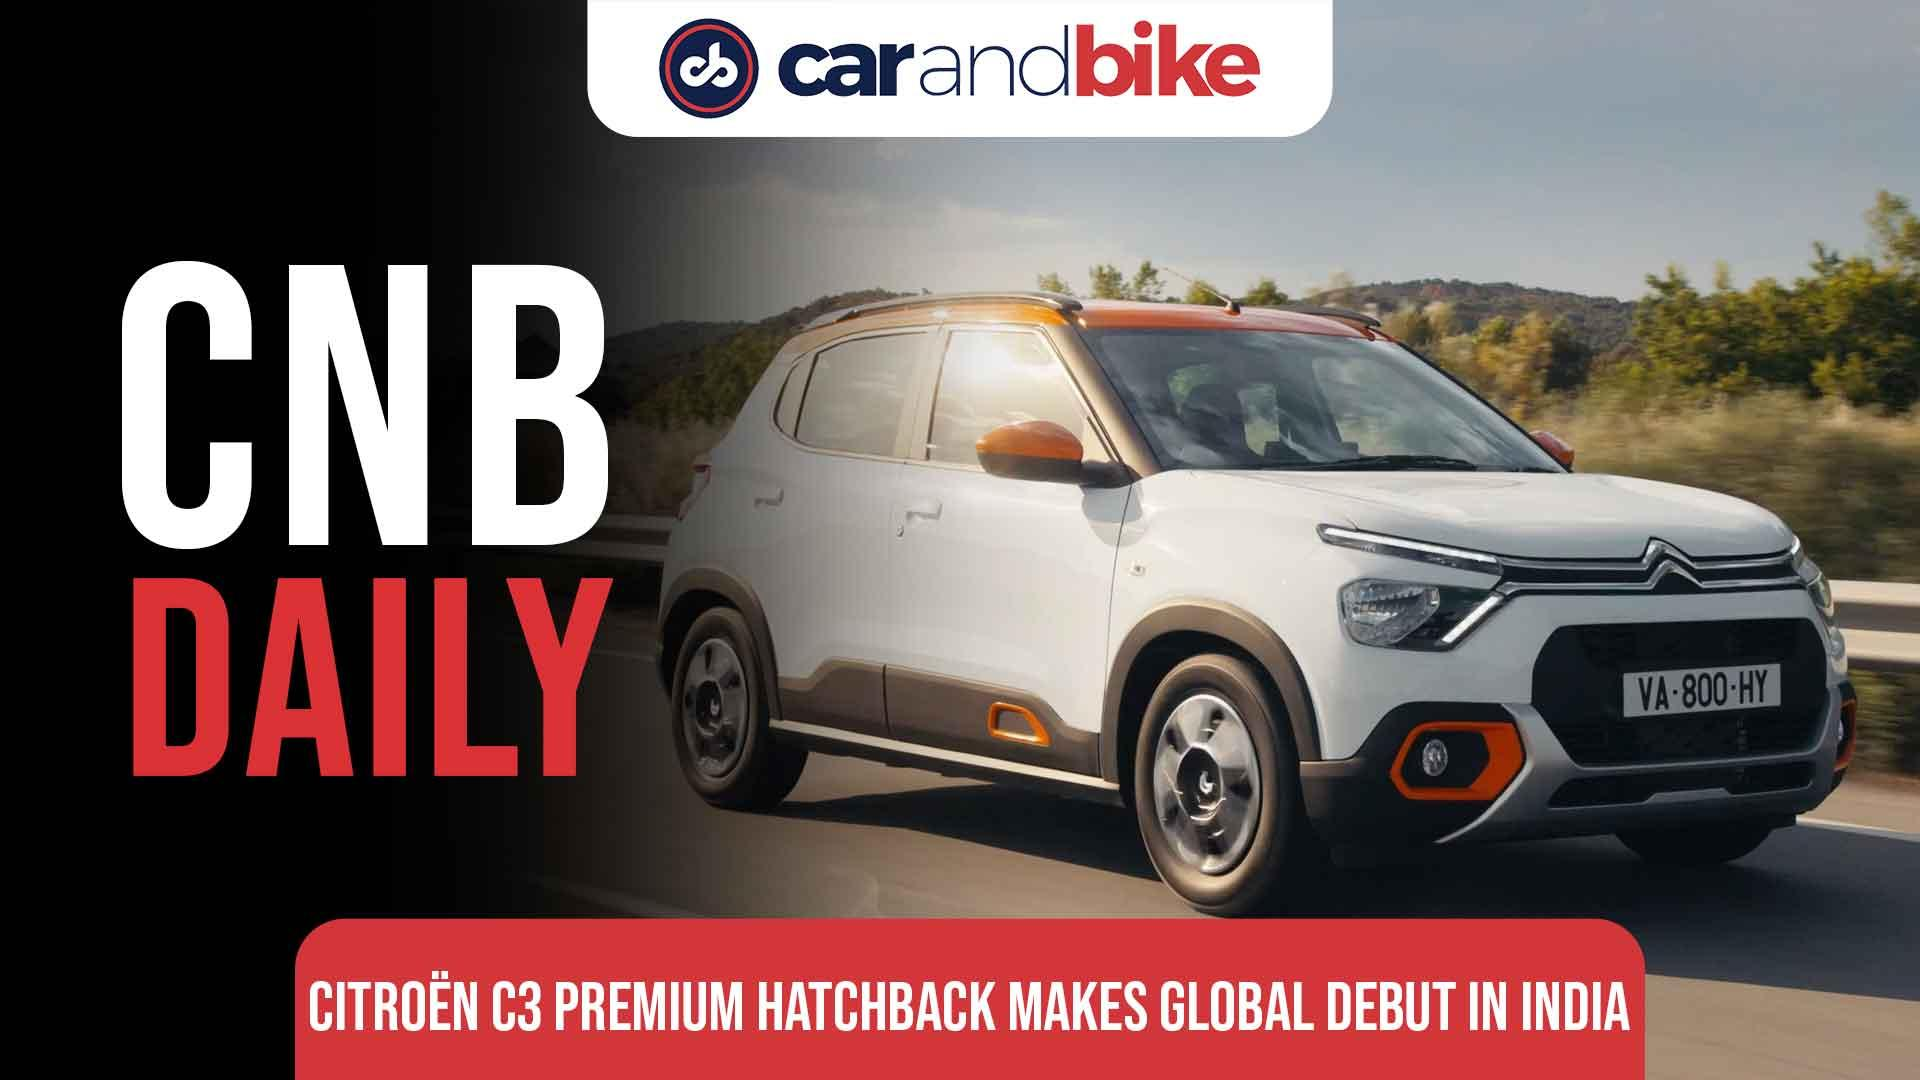 Citroen C3 Premium Hatchback makes global debut in India